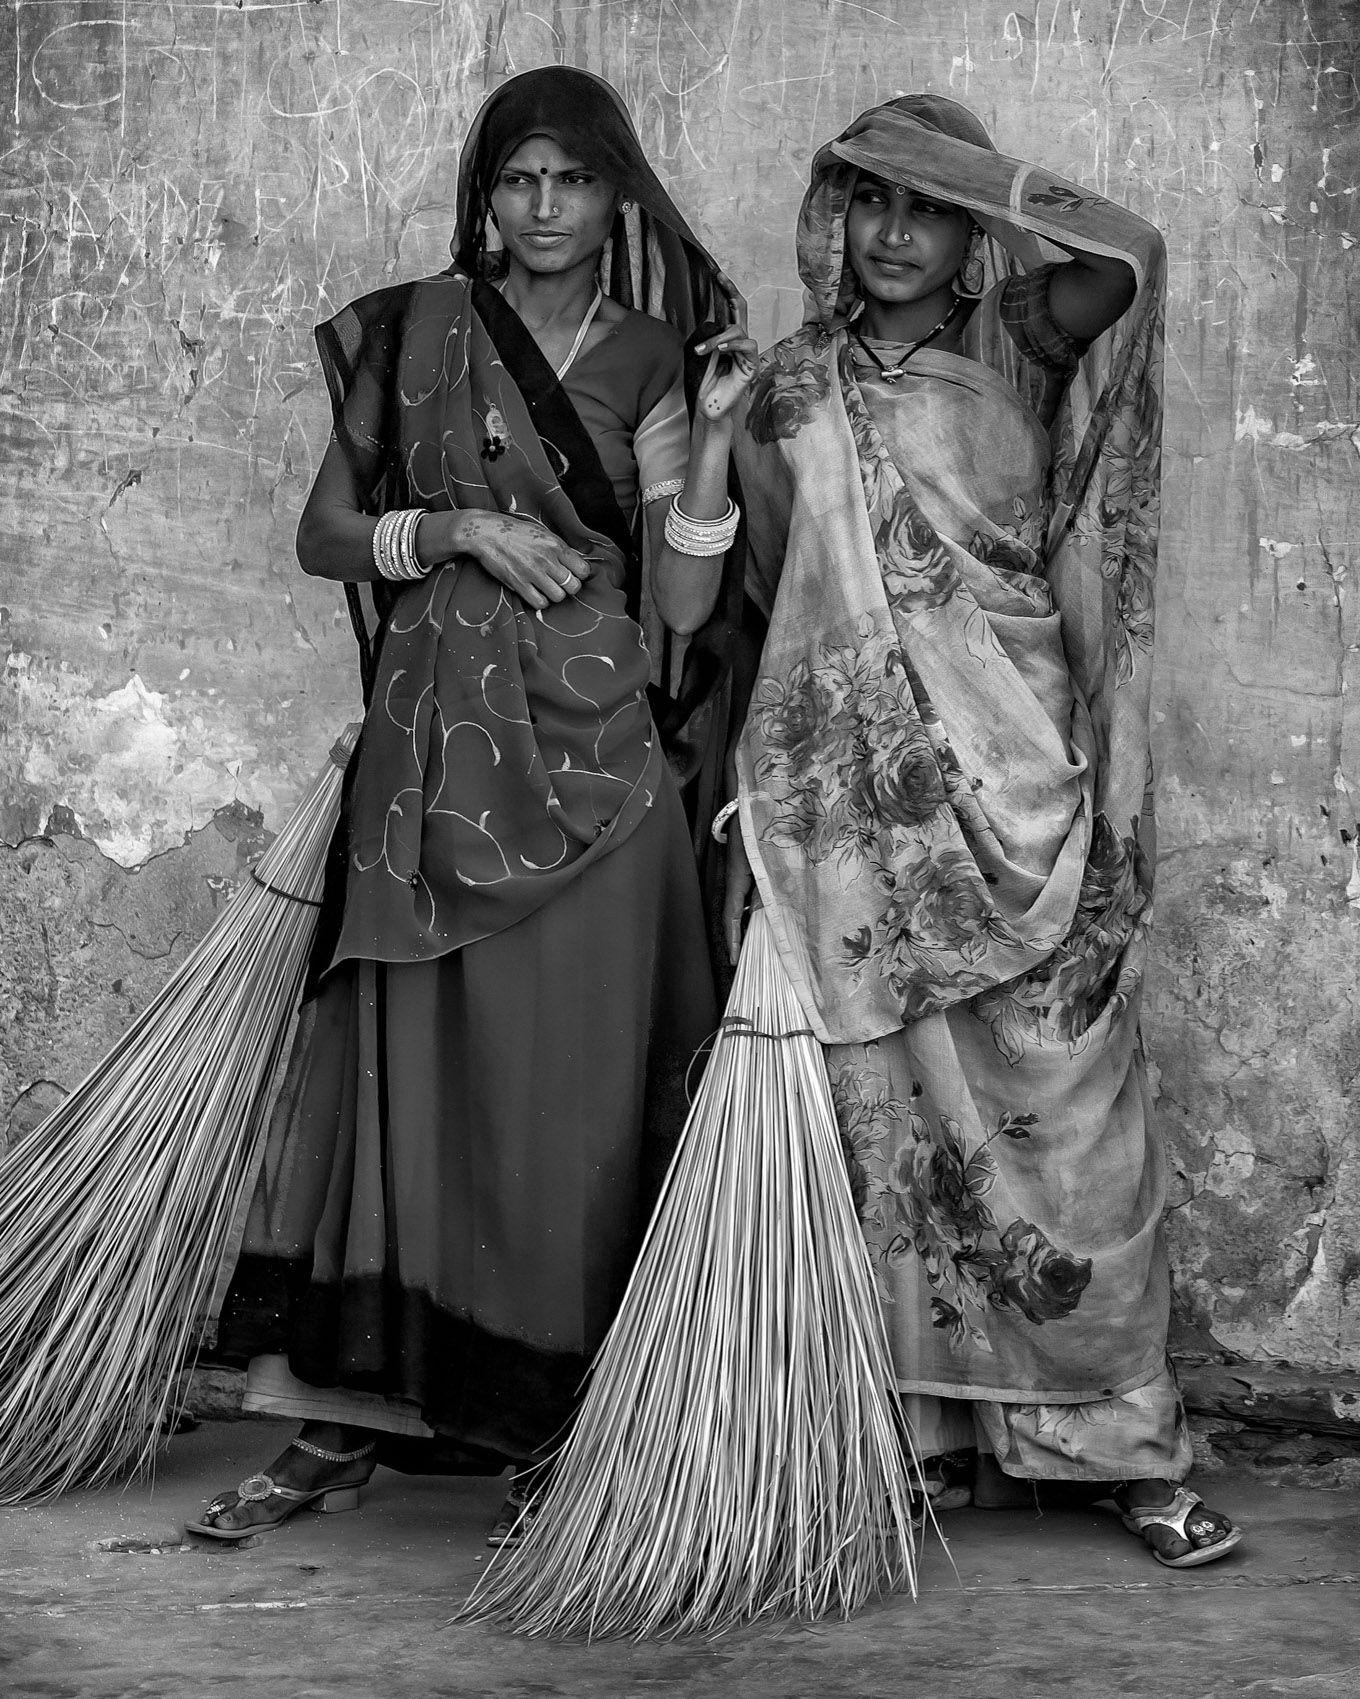 work.laborers-4.jpg